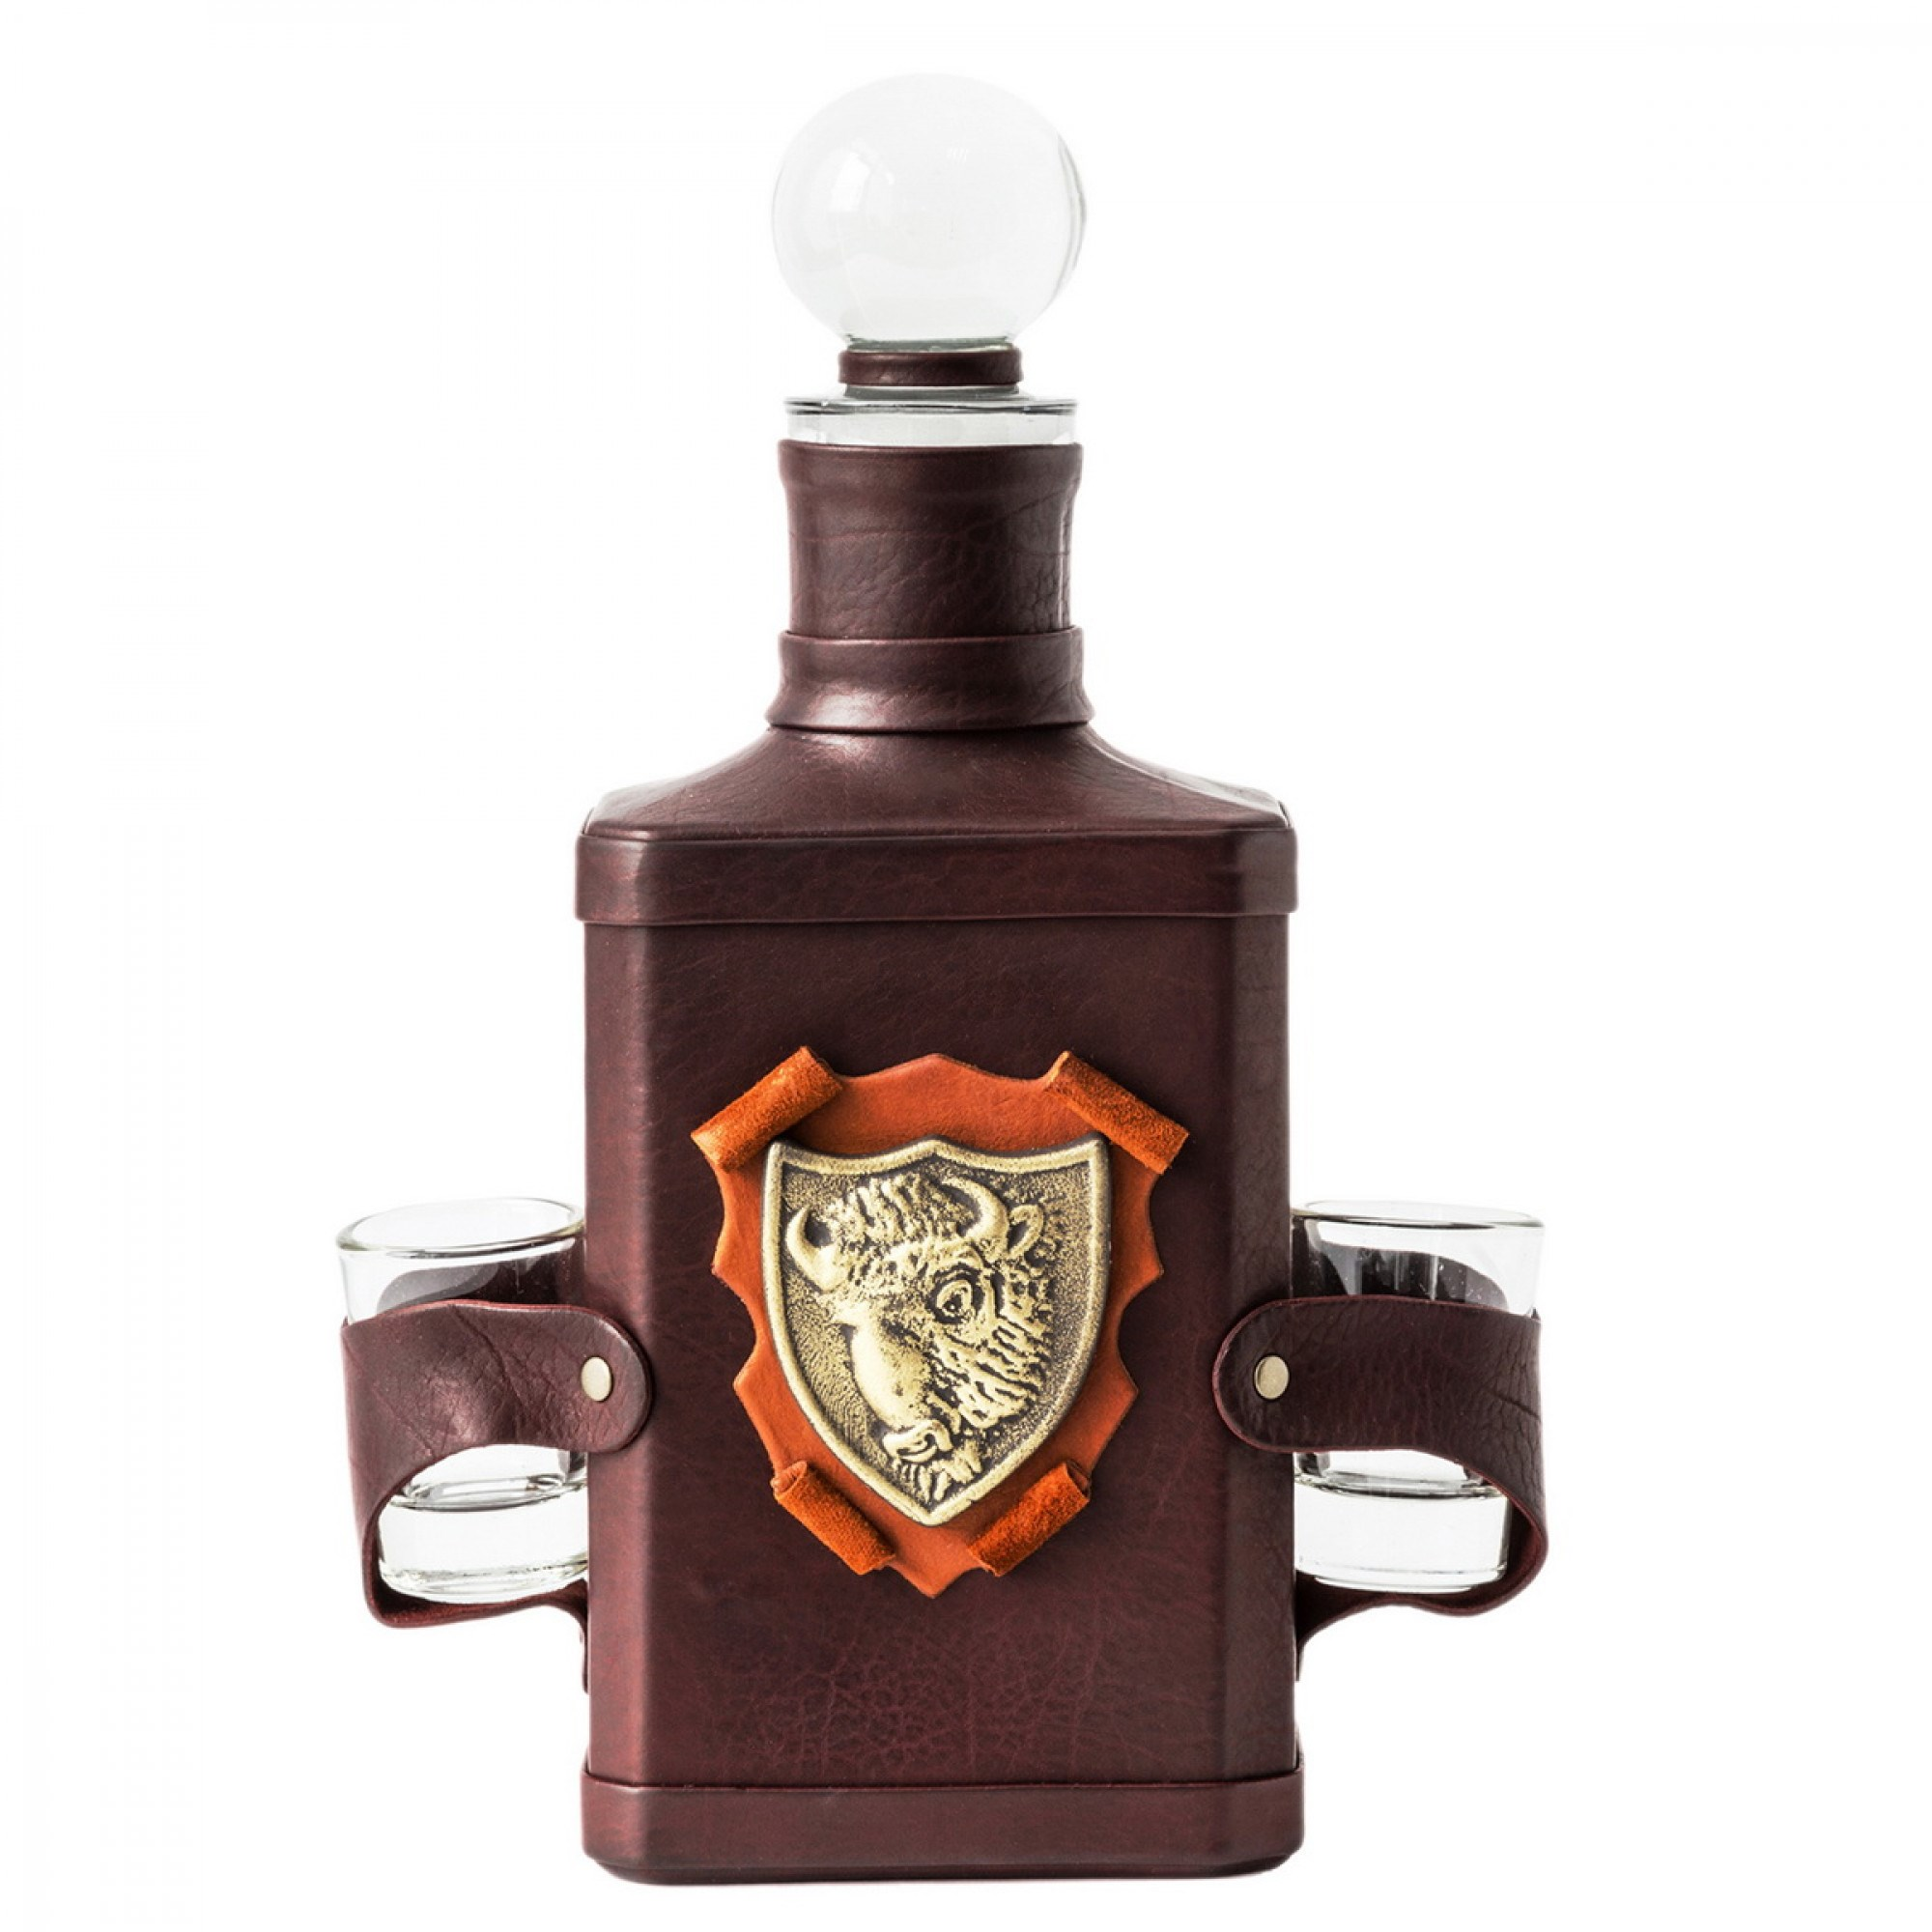 Штоф для водки или ликёра в декоративном кожаном футляре